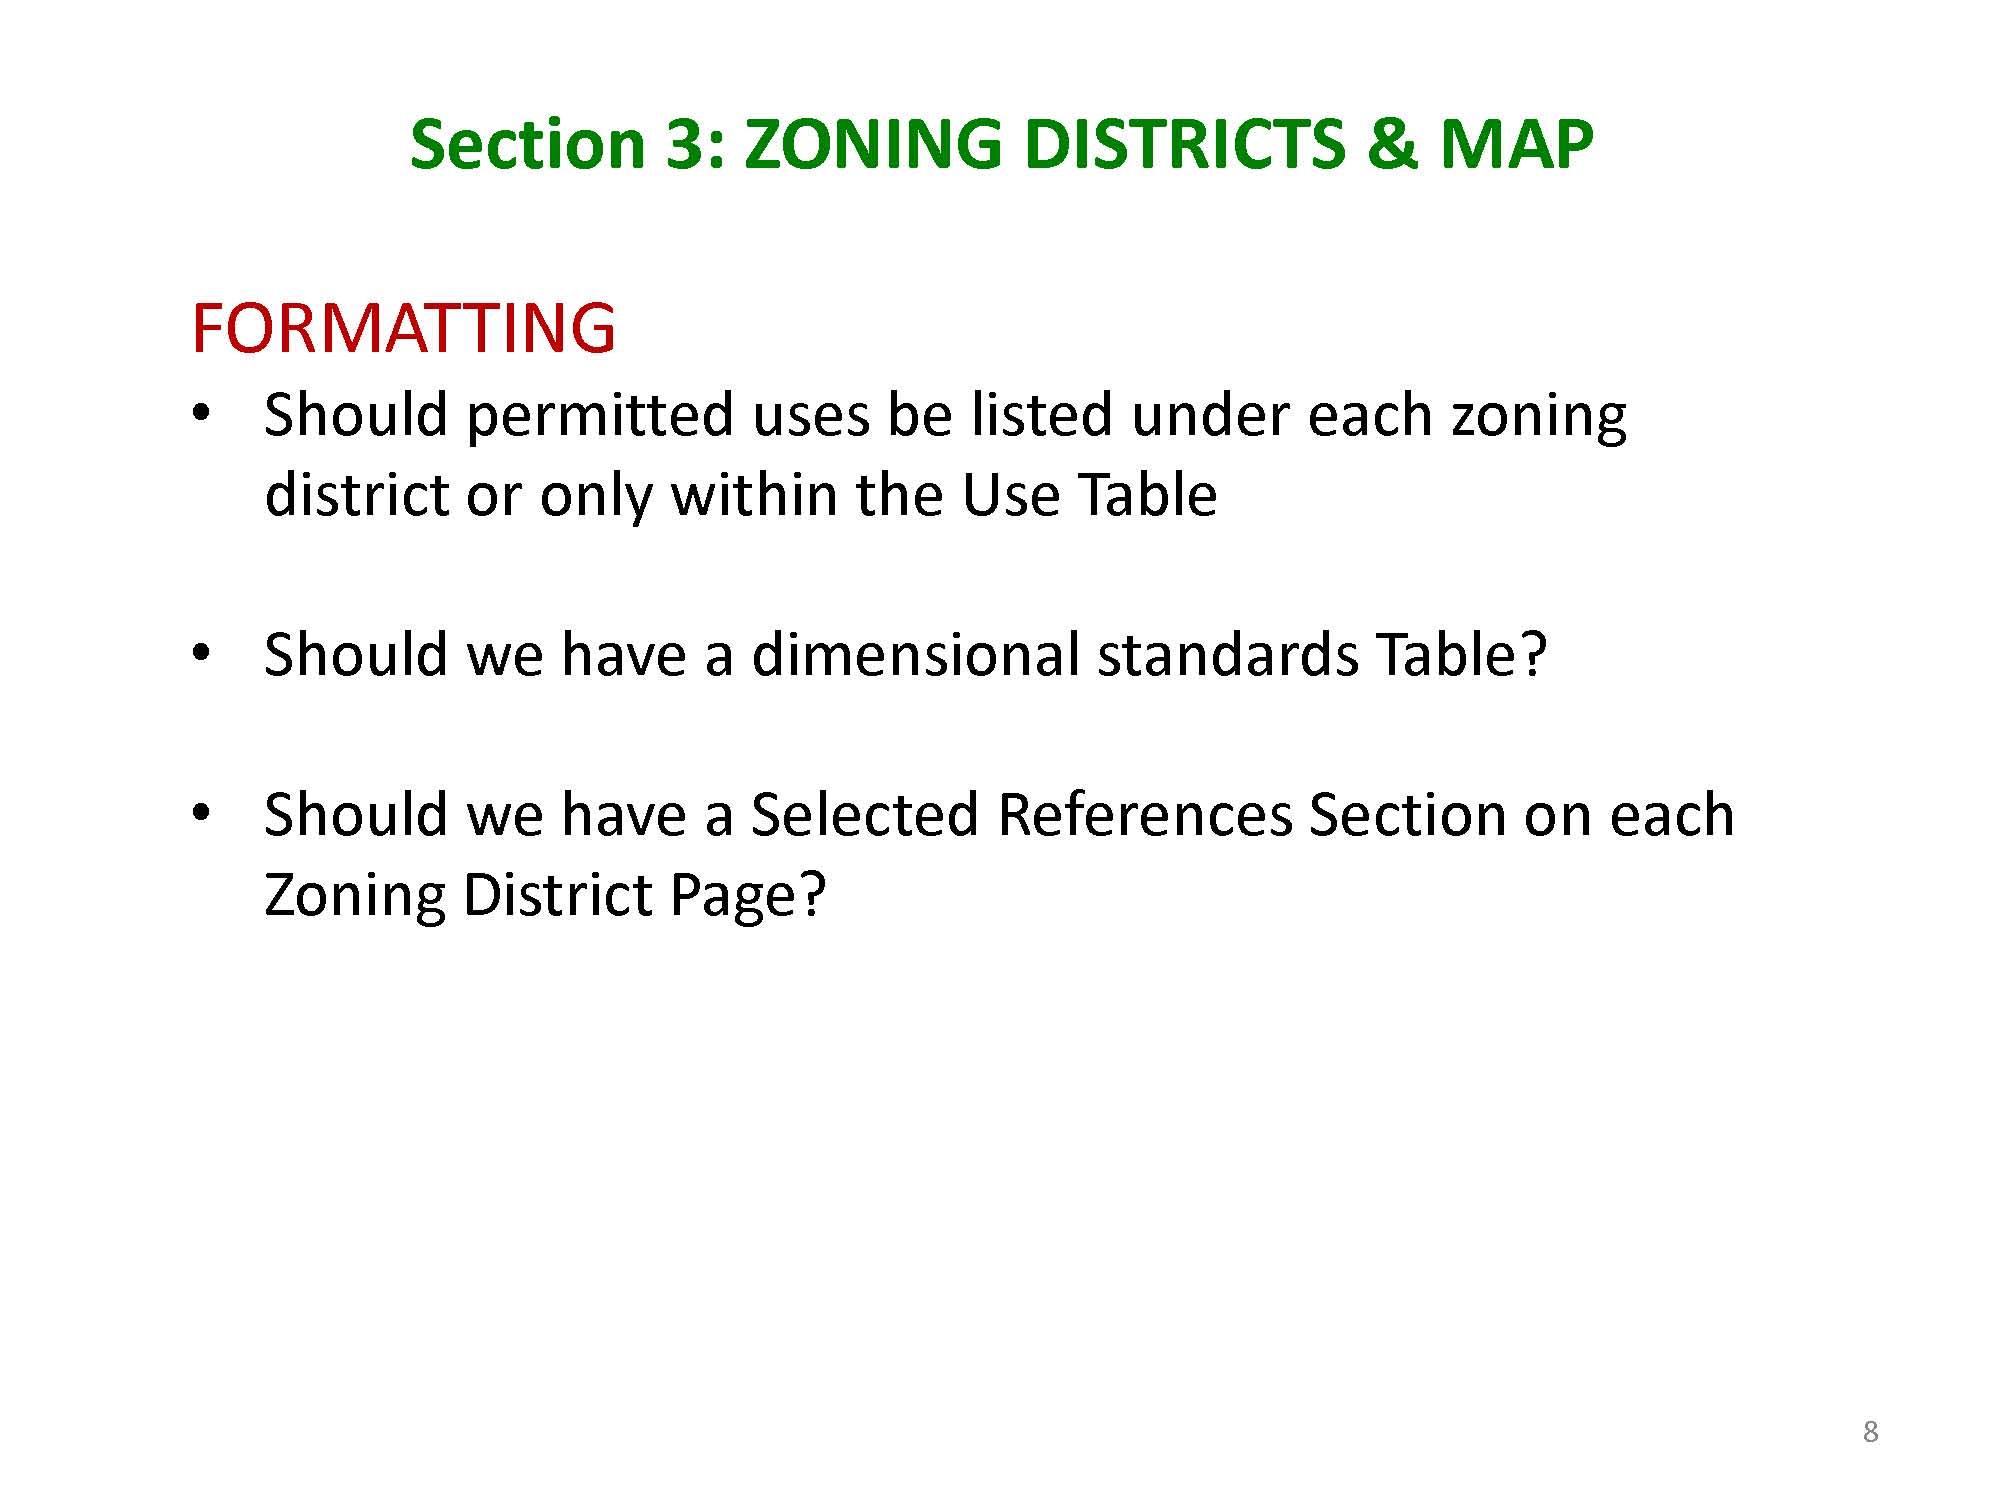 ZC Mtg PPT Final 4-18-18_Page_08.jpg